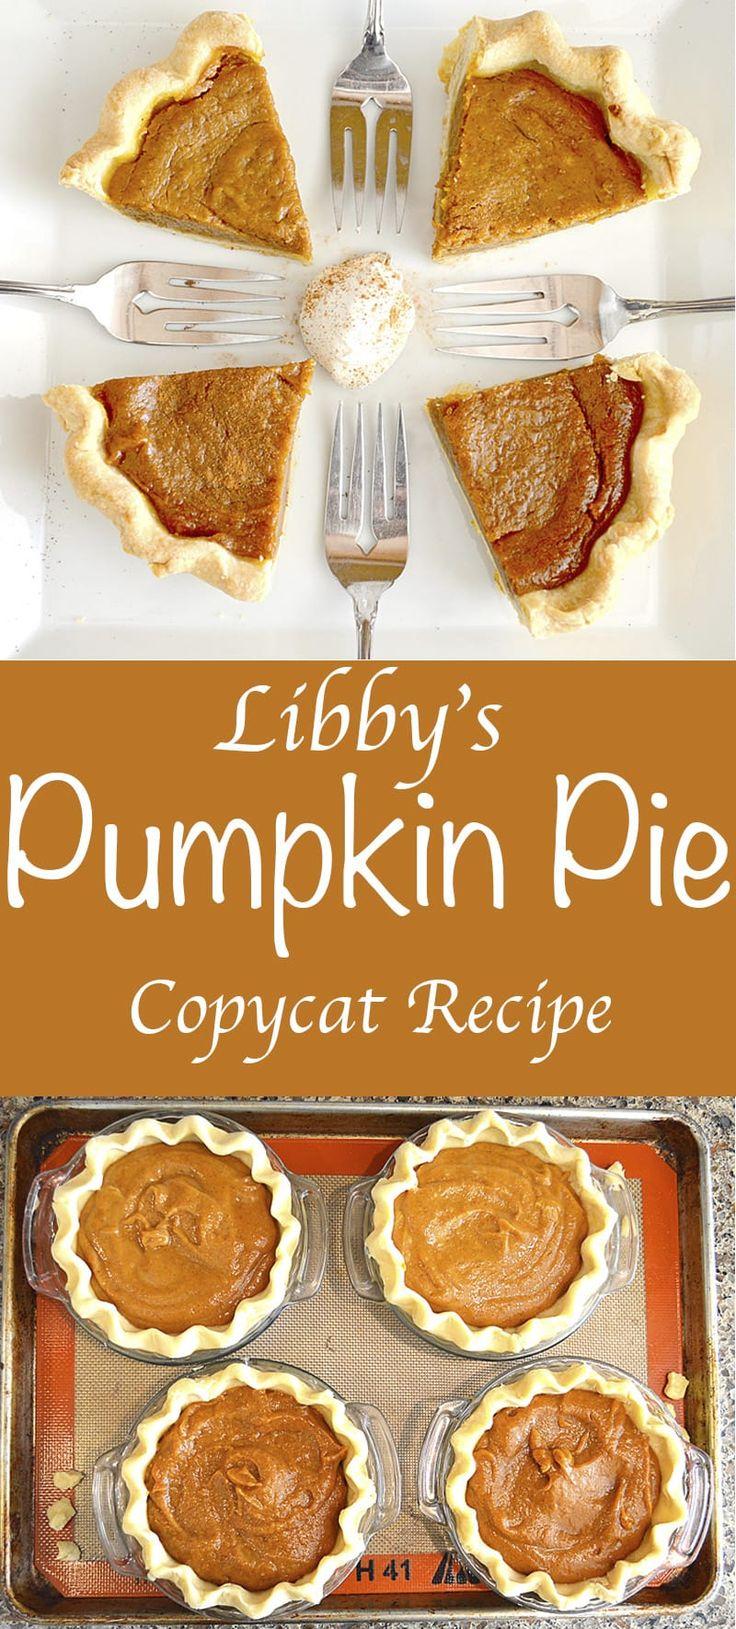 Libby's Pumpkin Pie Copycat Recipe